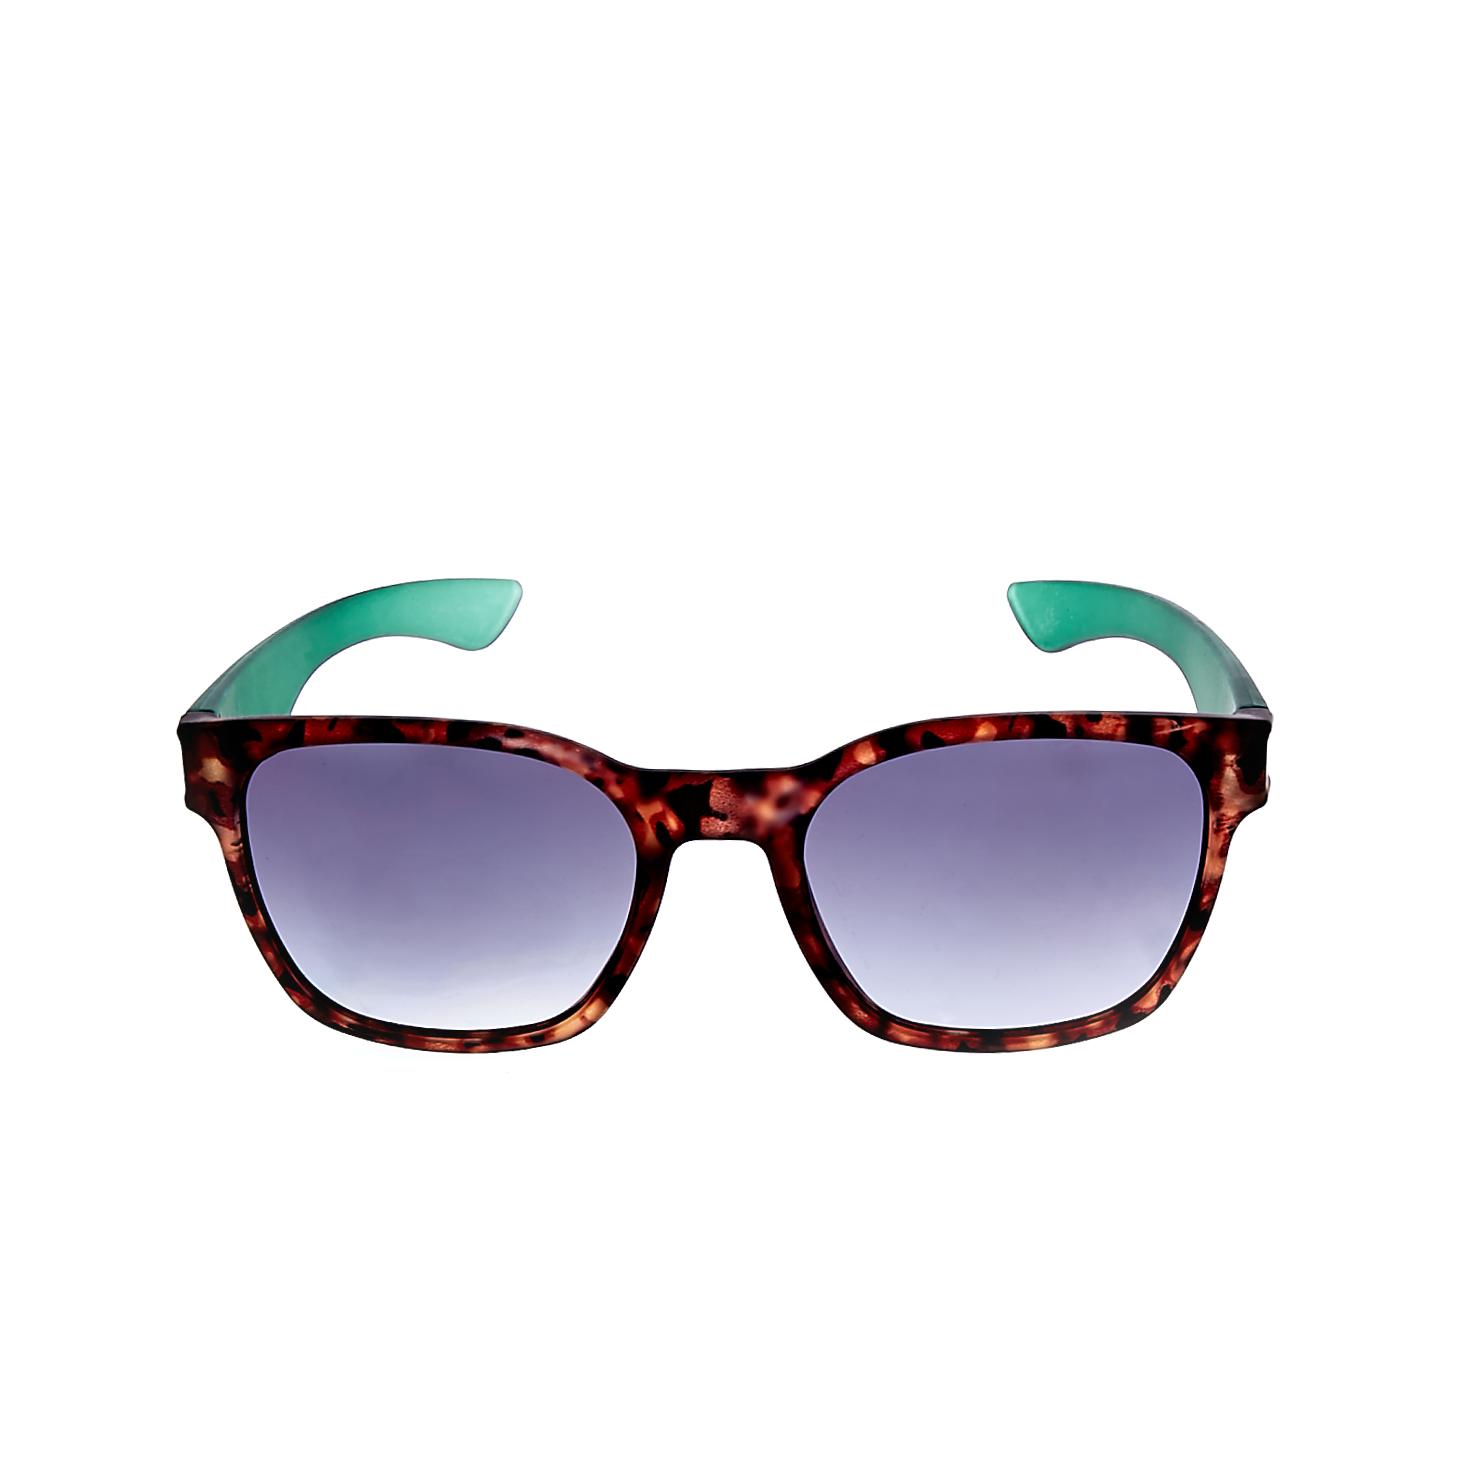 5c205c8f2b BREO - Γυαλιά ηλίου SUNDOWN καφέ-πράσινα